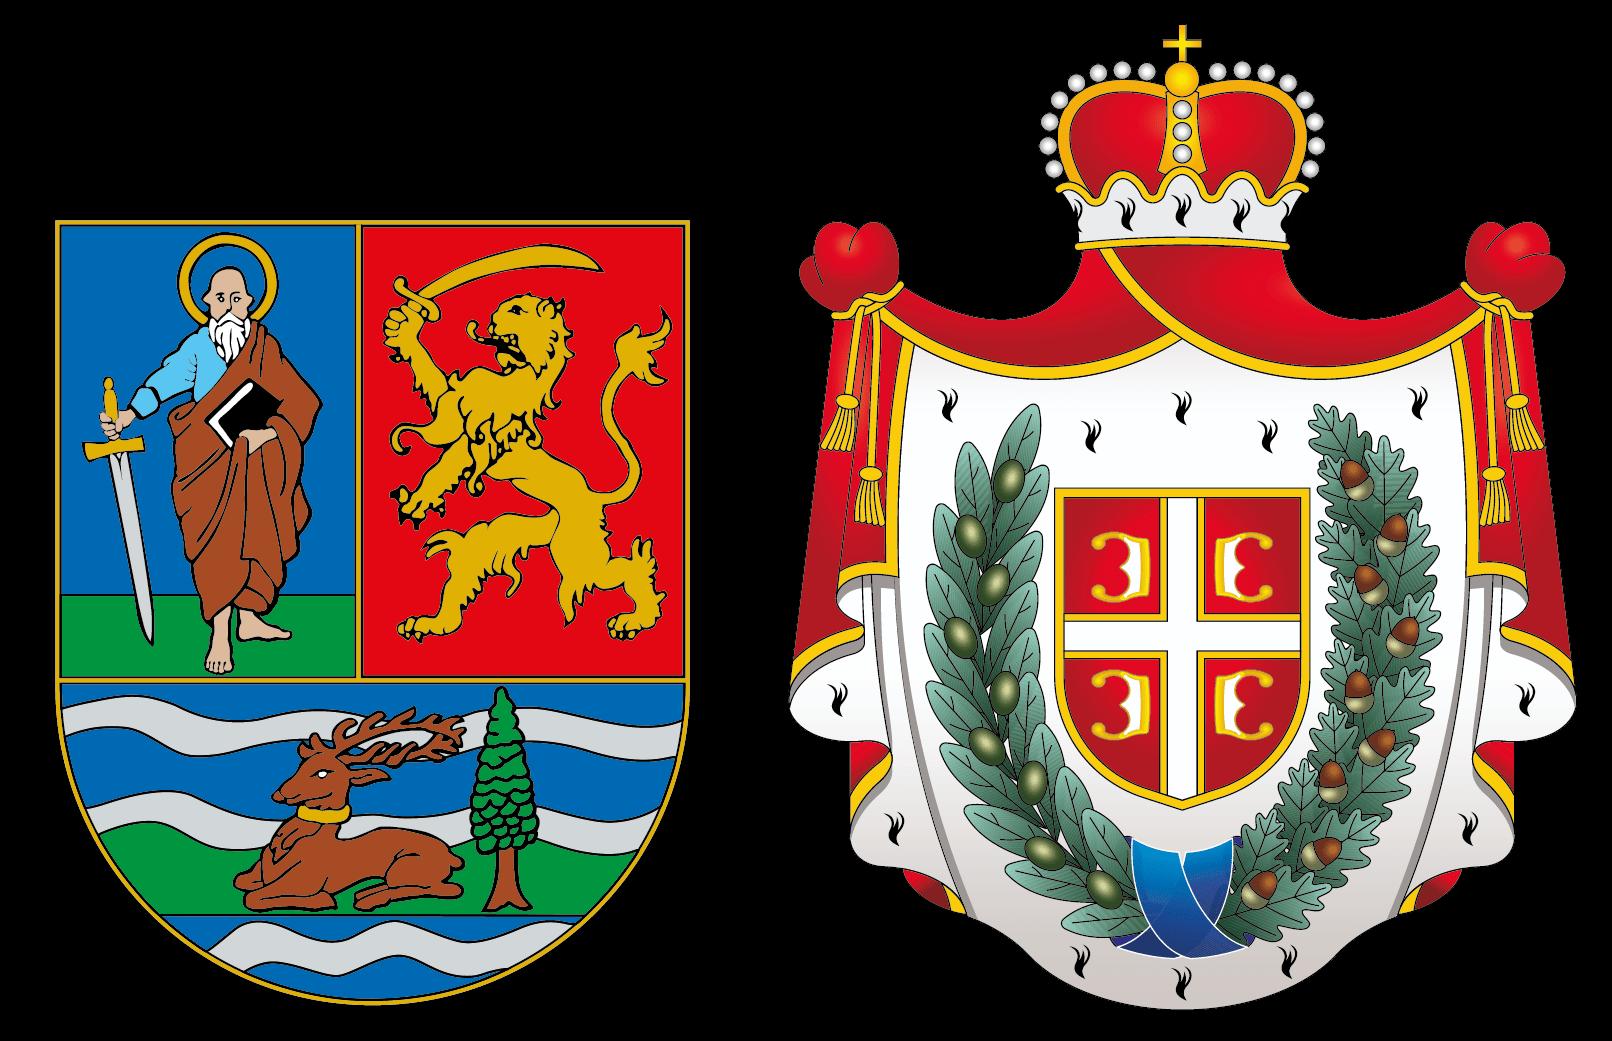 pokrajinski sekretarijat pokrajina logo dupli grb